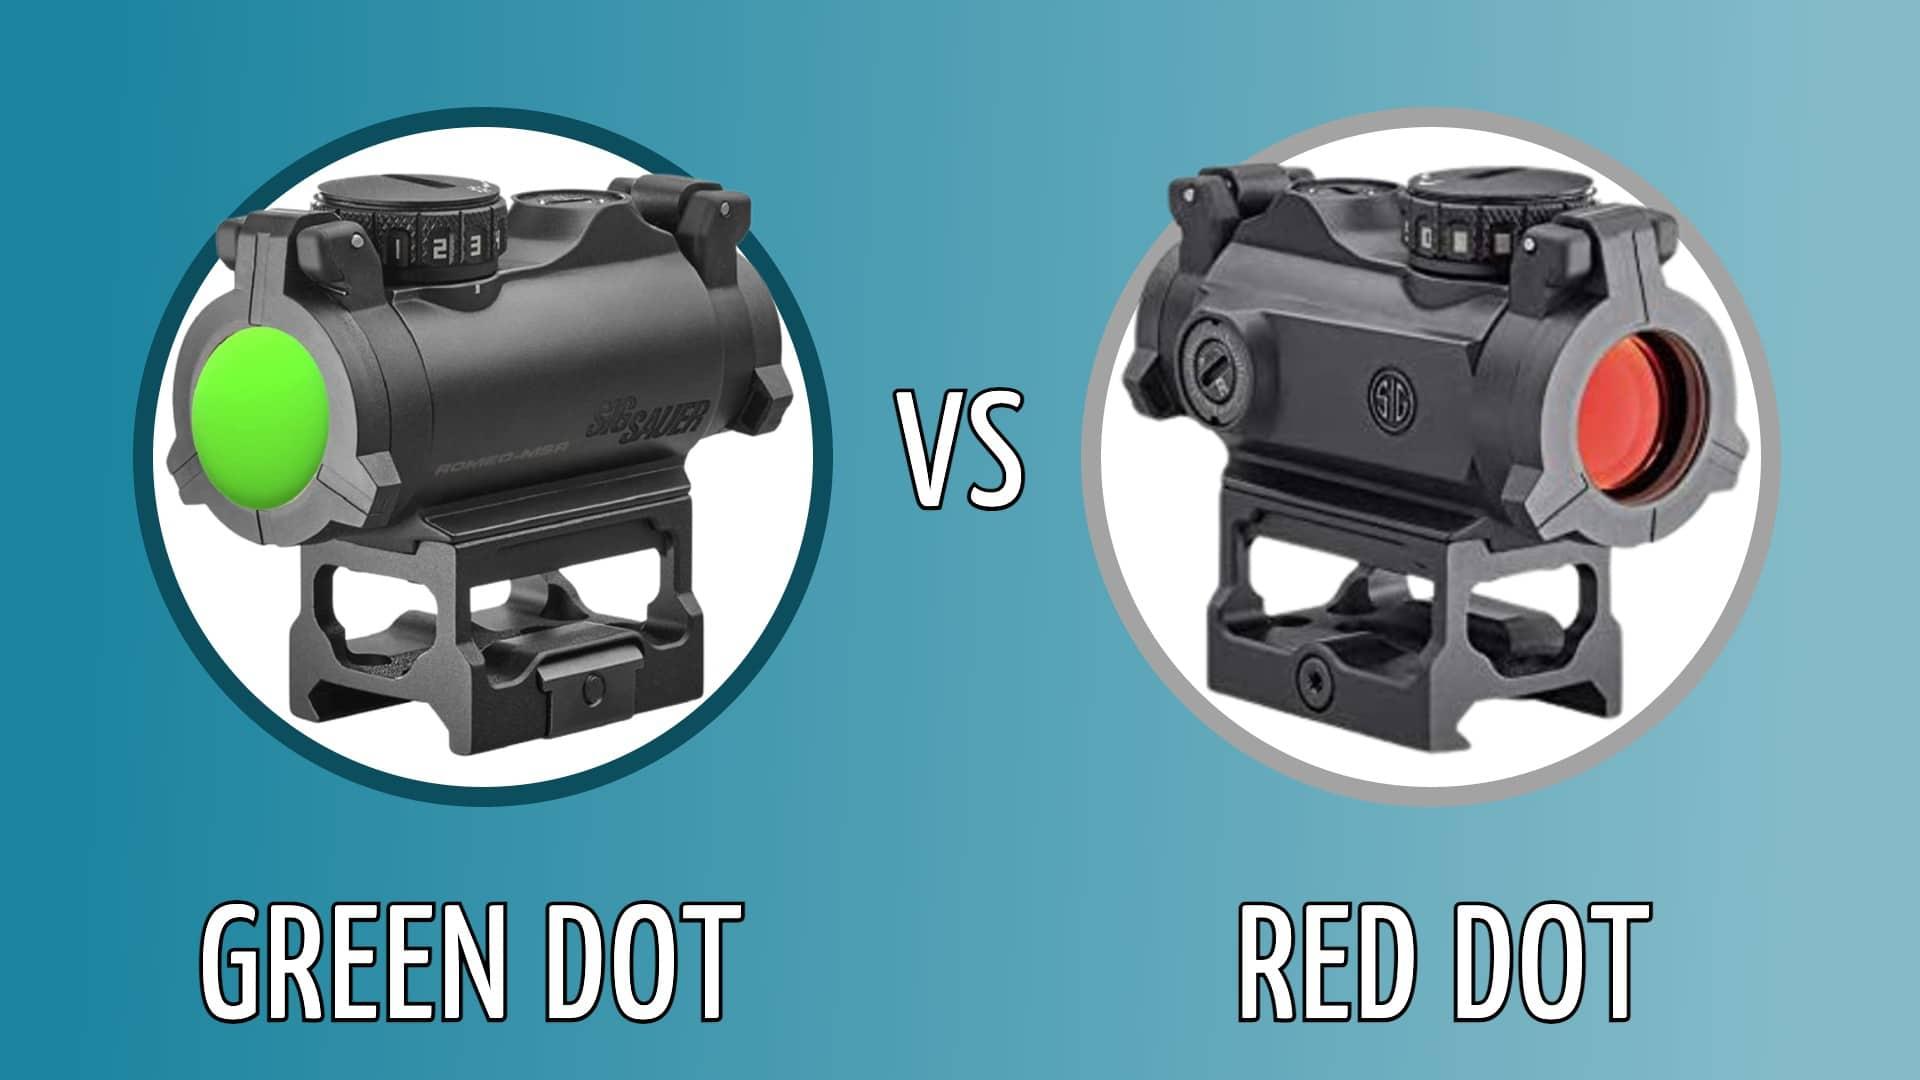 GReen dot vs red dot sight